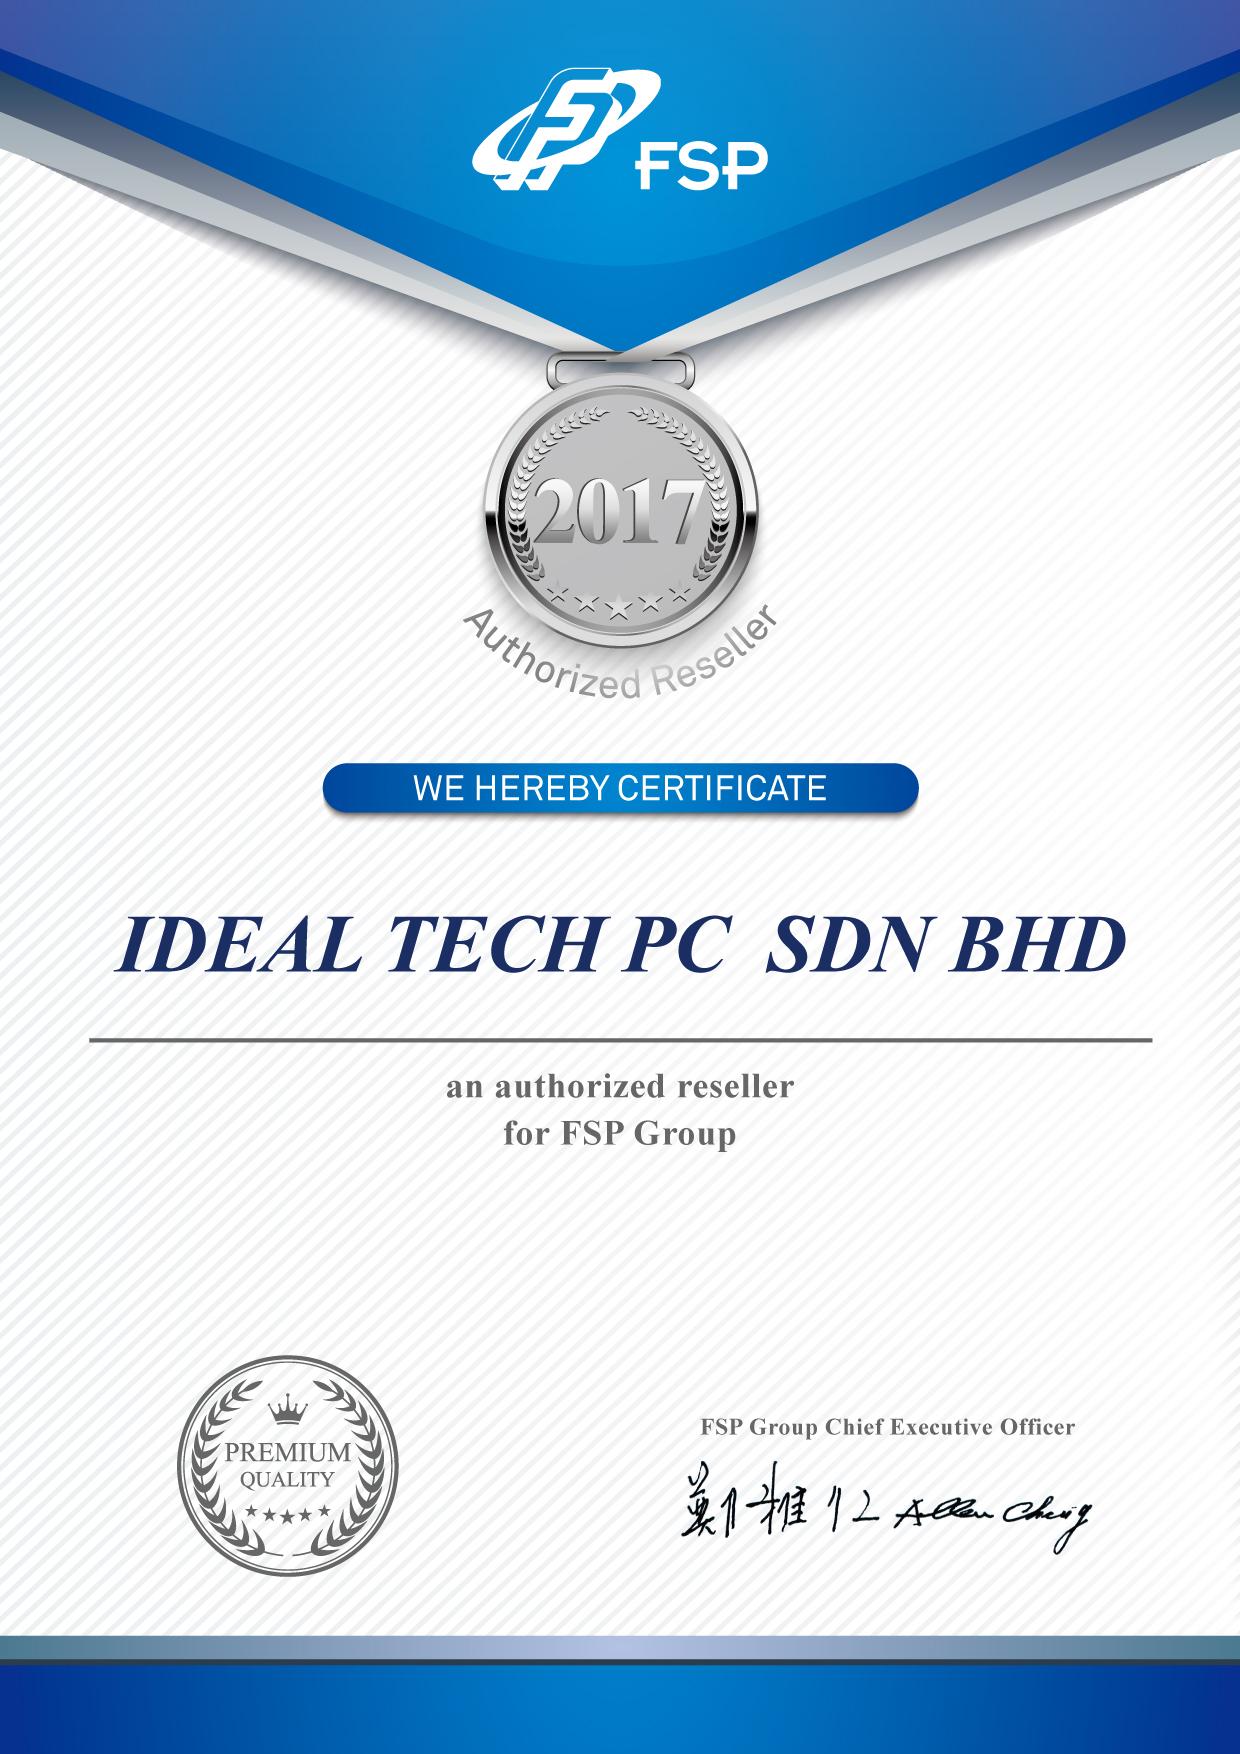 FSP_通路商證書_2017_IDEAL-TECH-PC-SDN-BHD-01